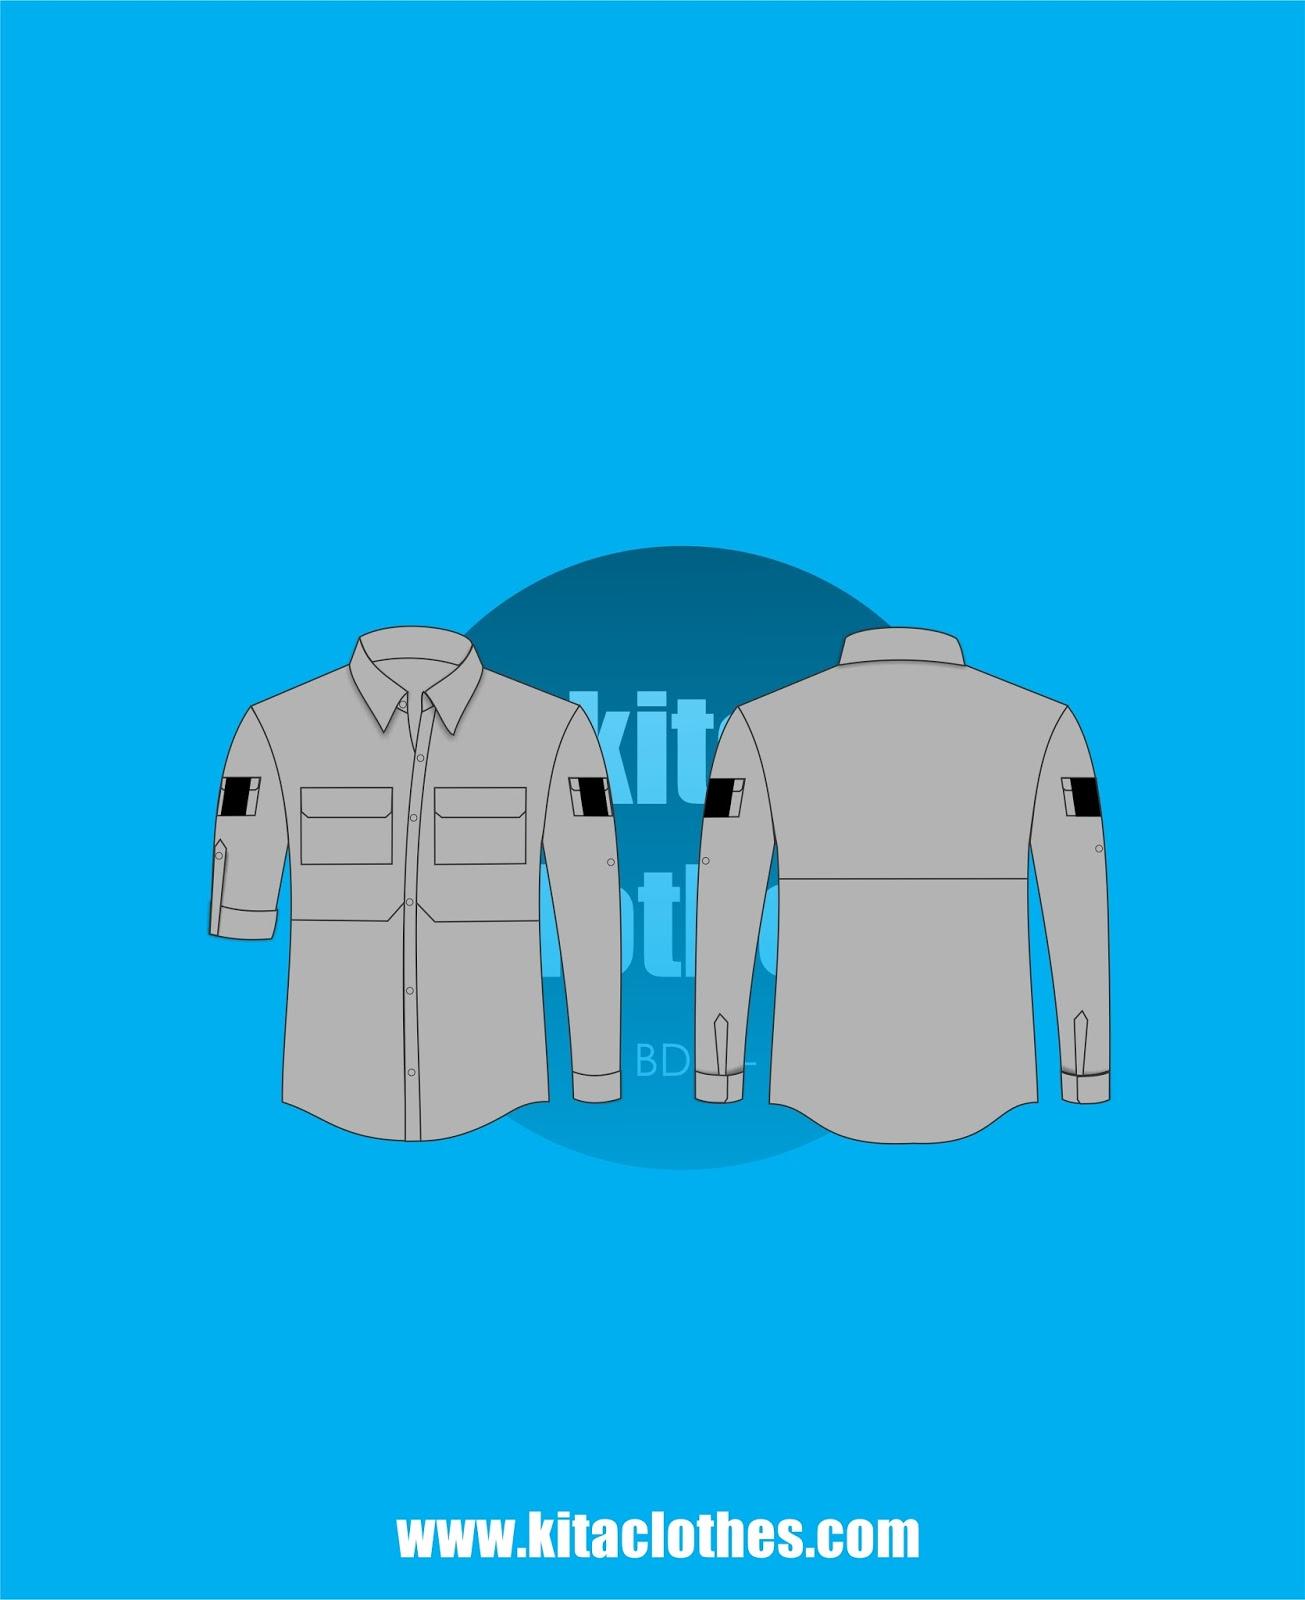 Template Kemeja Pdl : template, kemeja, Clothes, Bandung:, Template, Desain, Kemeja, Lapangan